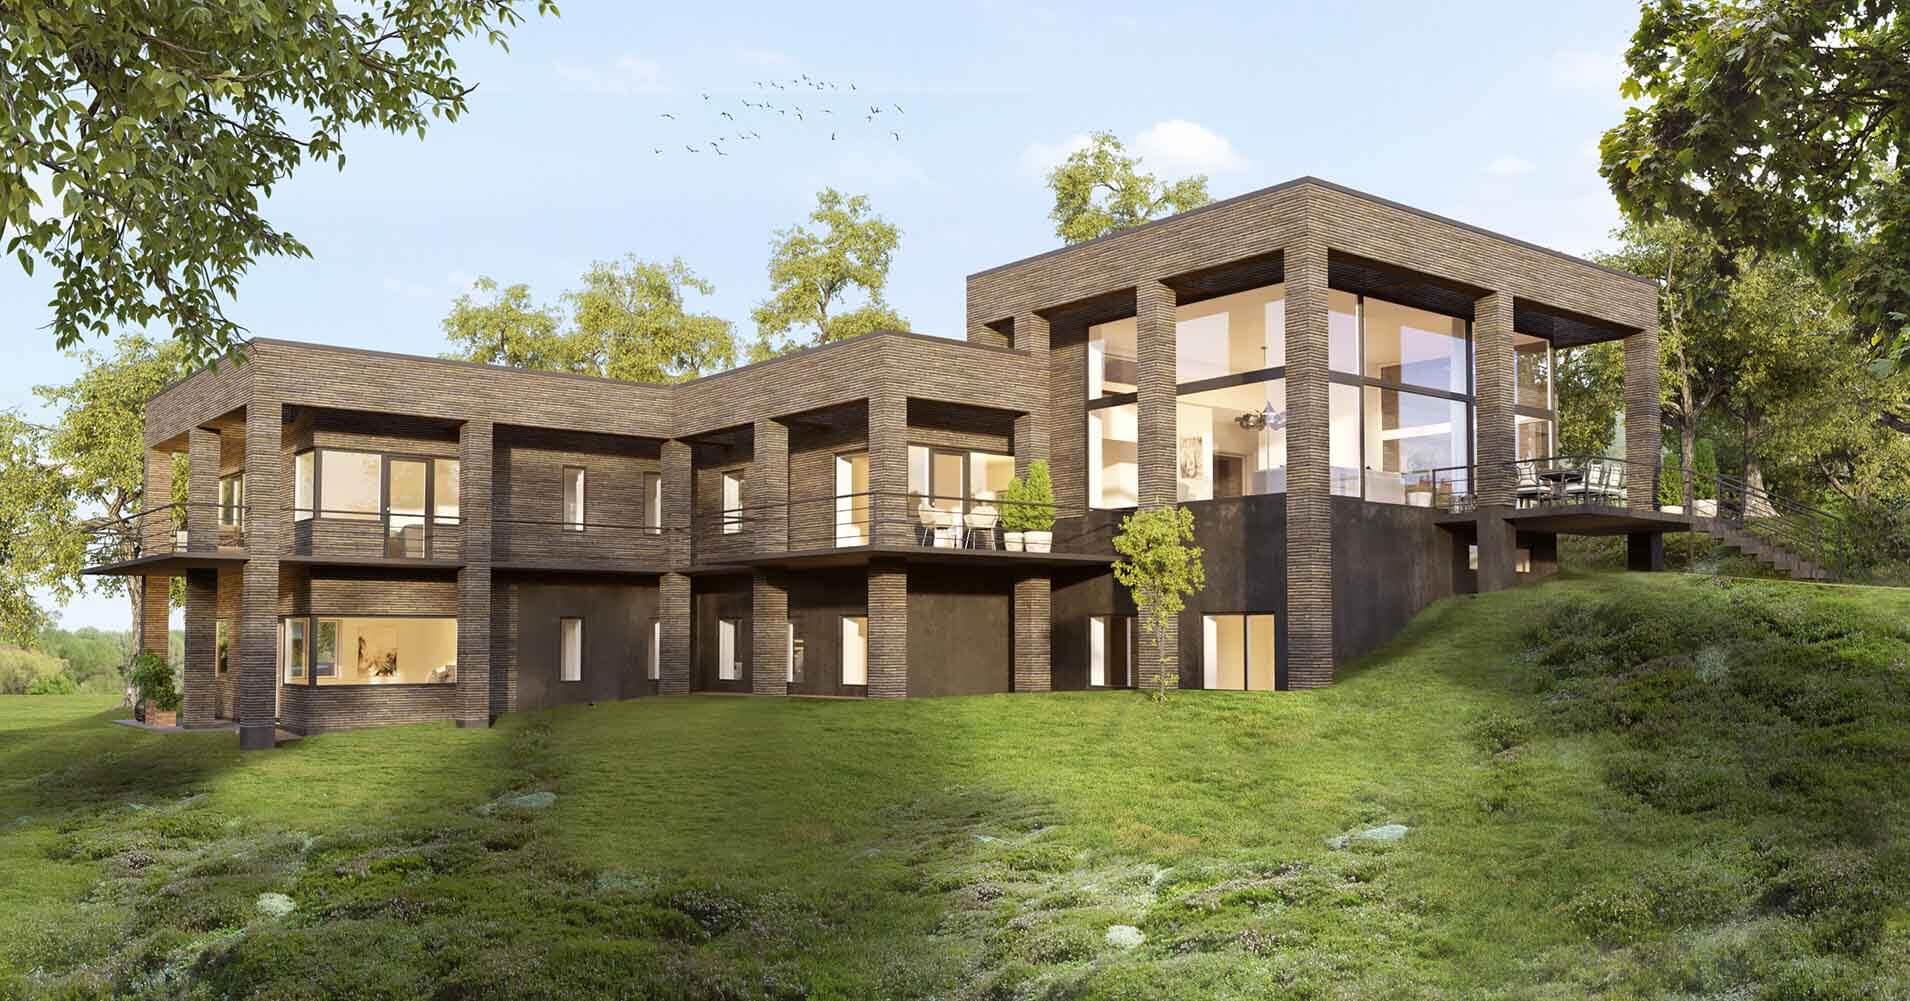 3D-Vizual | 3D Visualisering | Facade | Arkitekt 11.0 - Claus Francke Arkitekter Hus